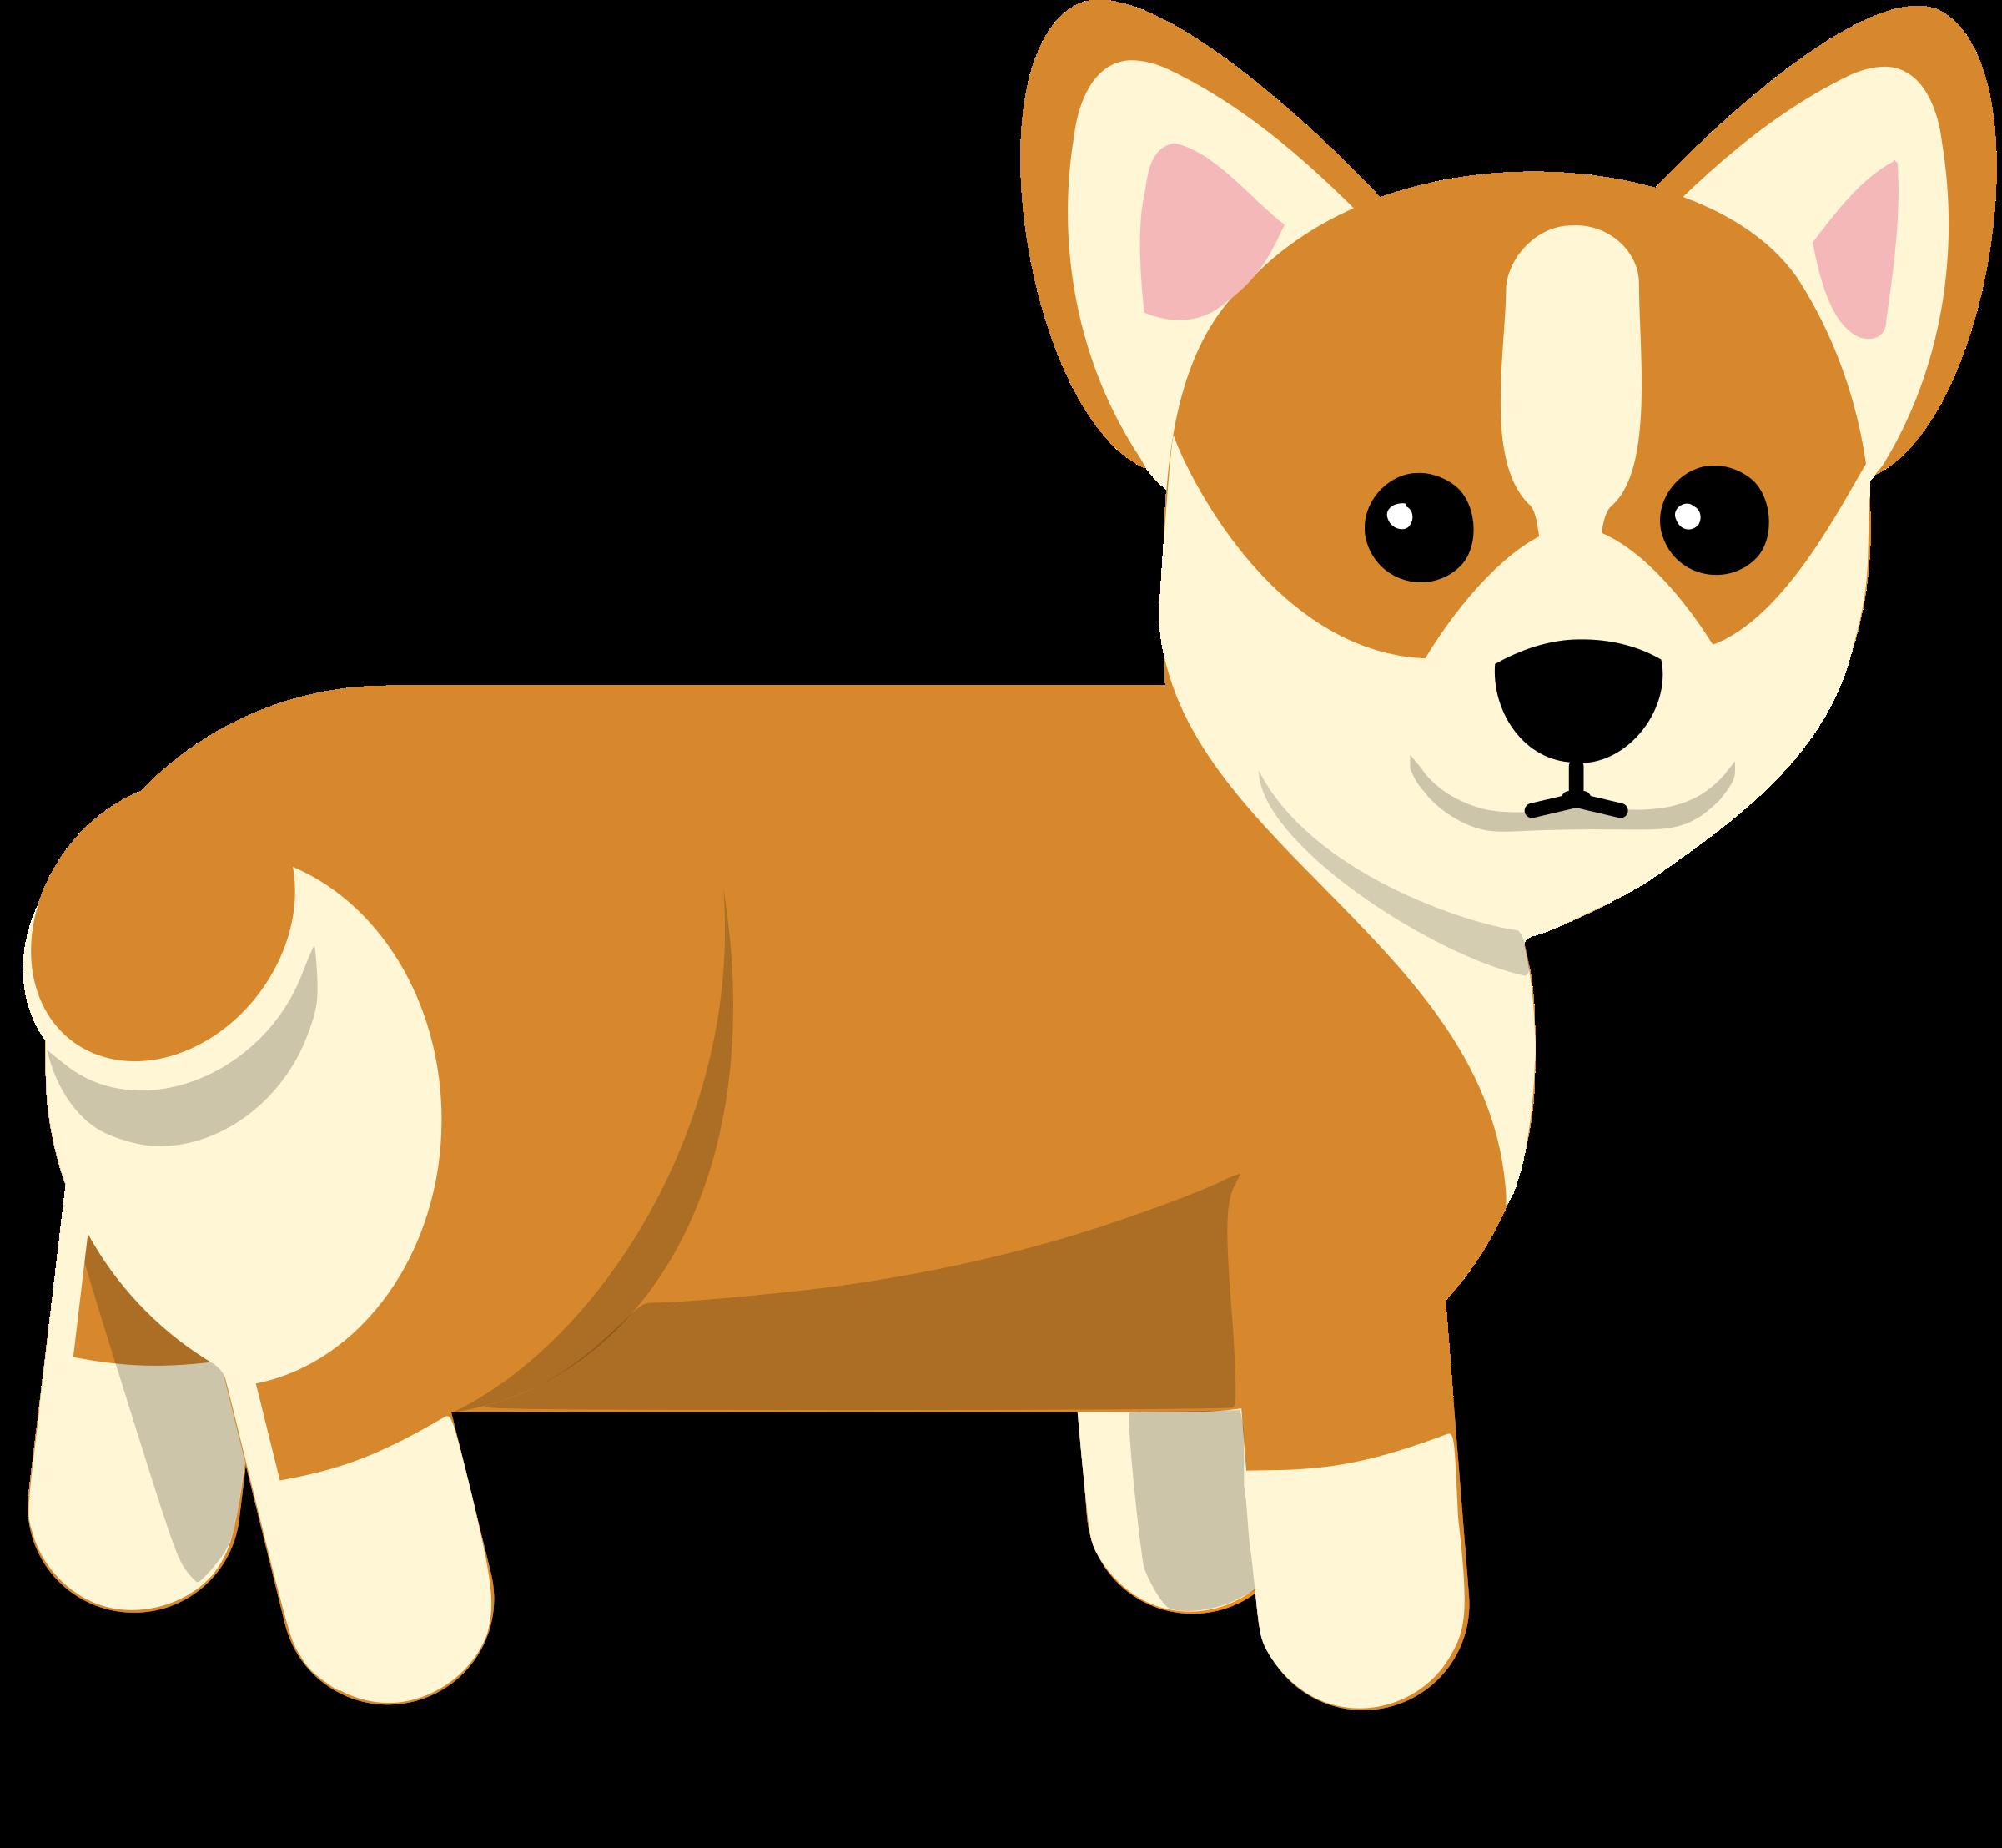 corgi dog vector clipart image free stock photo public domain rh goodfreephotos com vector clip art free download vector graphics clipart free download